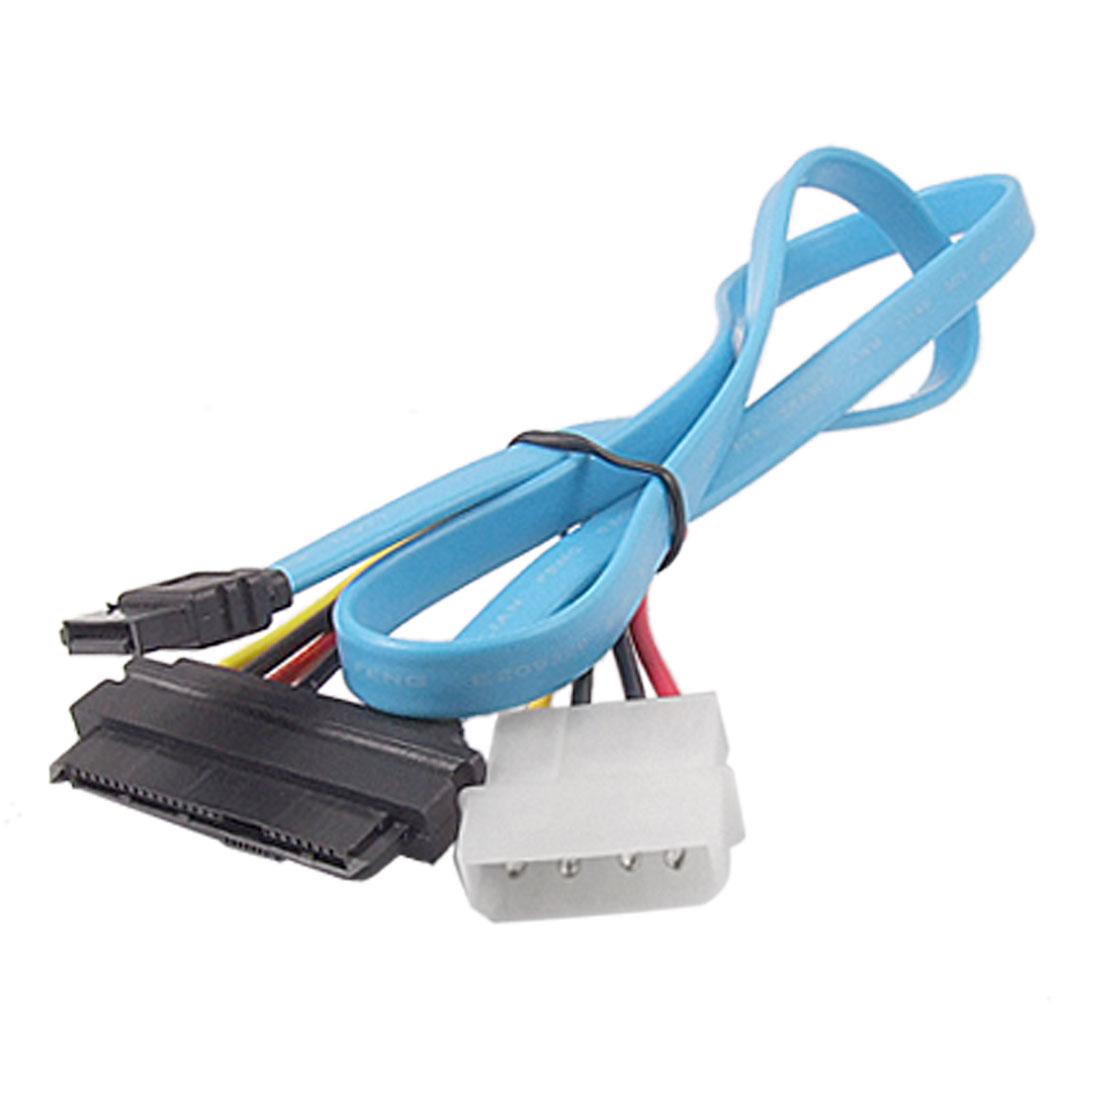 68CM 7 Pin SATA to SAS 29 Pin + 4 Pin Connector Power Cable